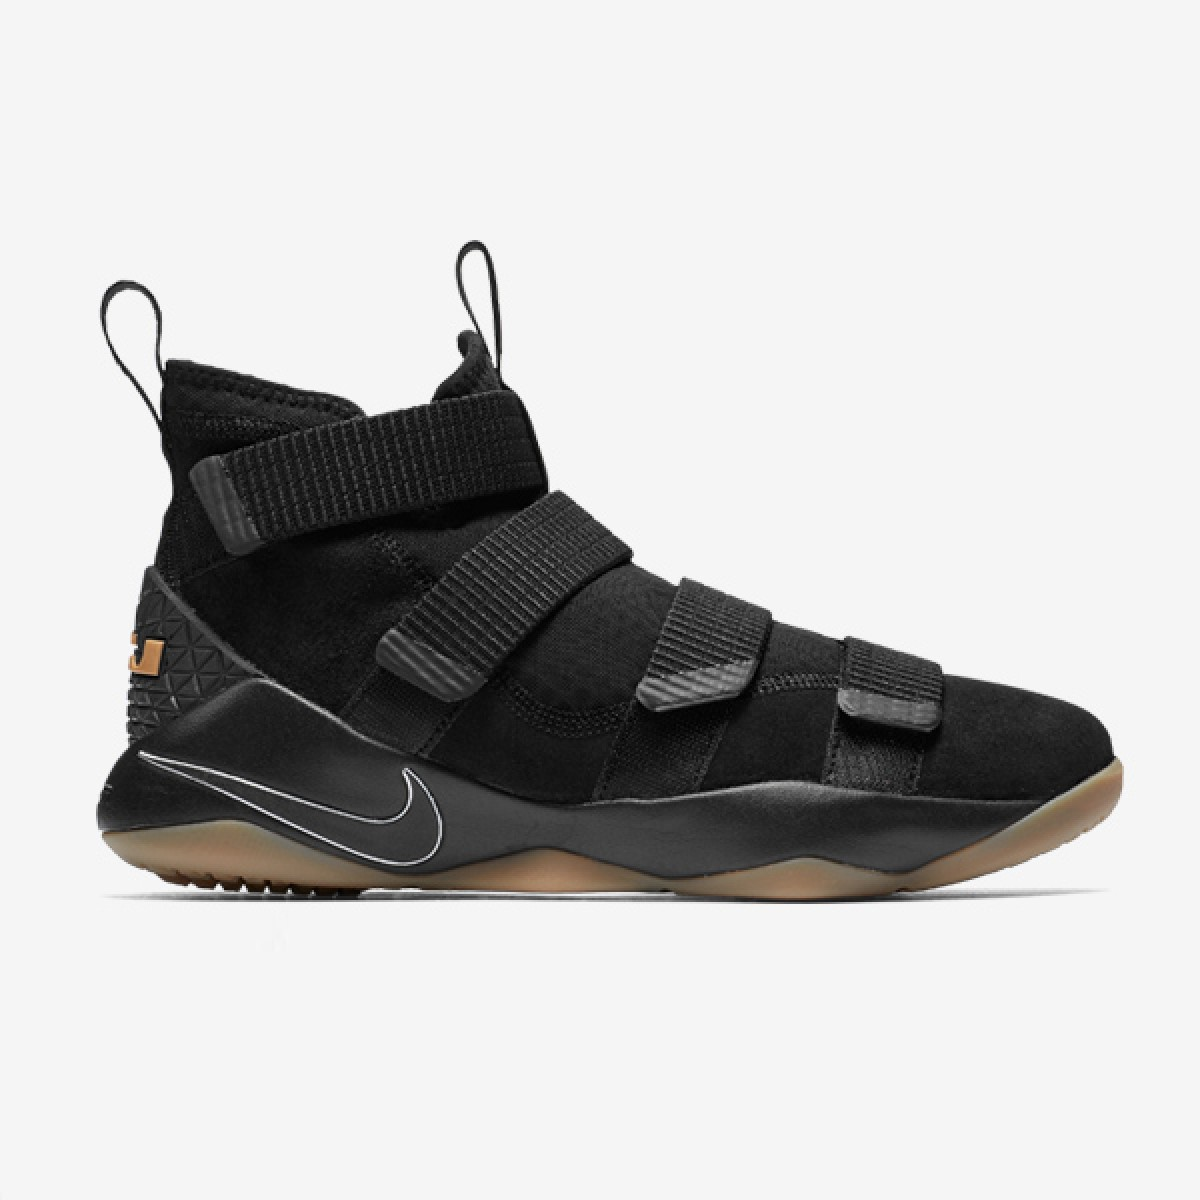 Nike Lebron Soldier XI 'Black Gum'